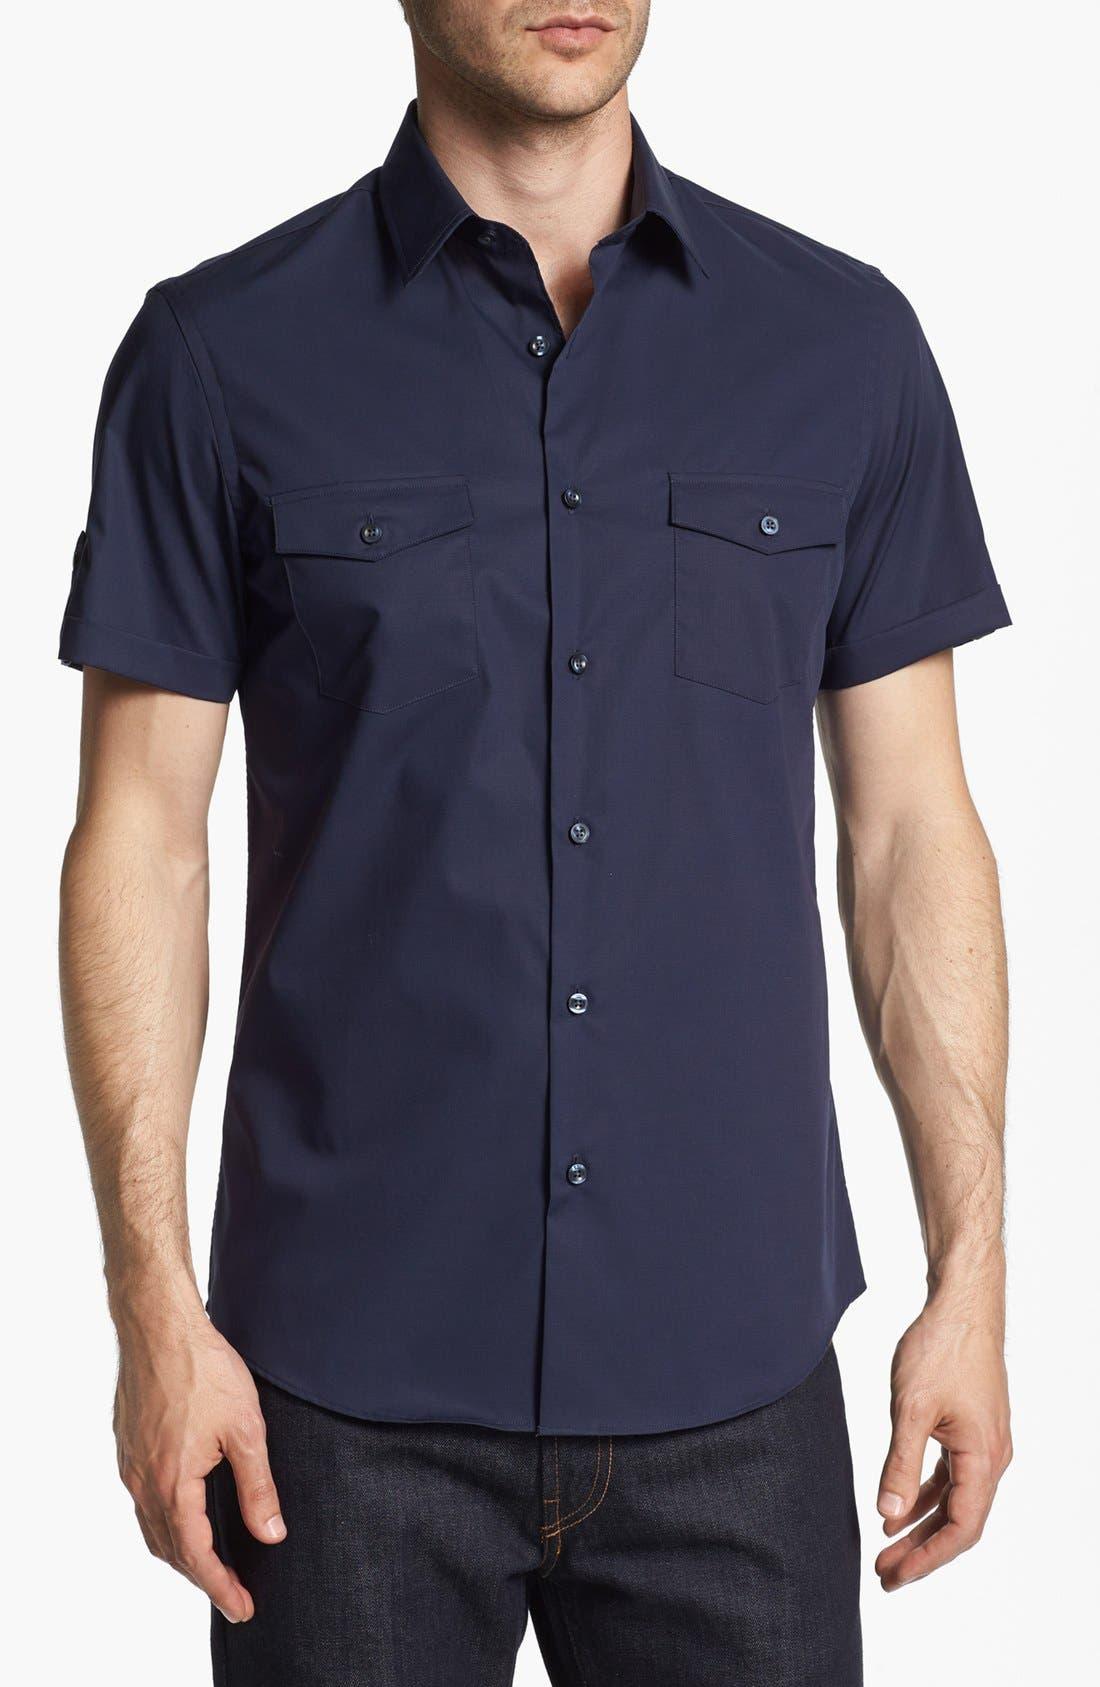 Alternate Image 1 Selected - Calibrate Trim Fit Short Sleeve Sport Shirt